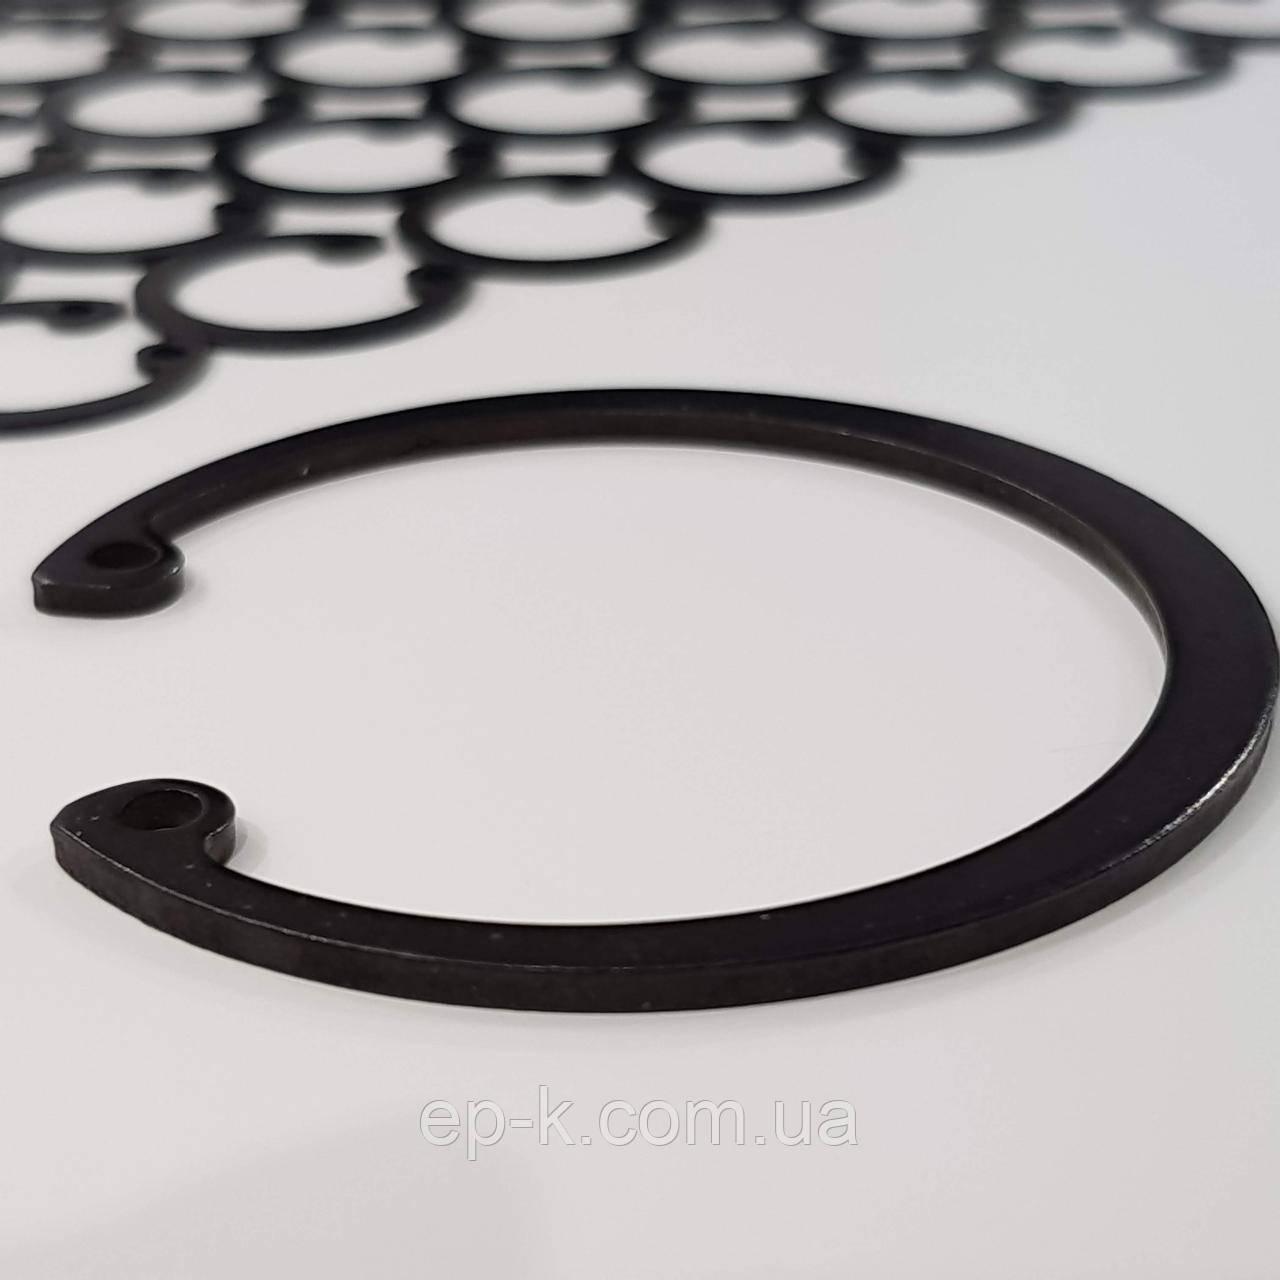 Стопорное кольцо внутреннее А110 ГОСТ 13943-86, DIN 472